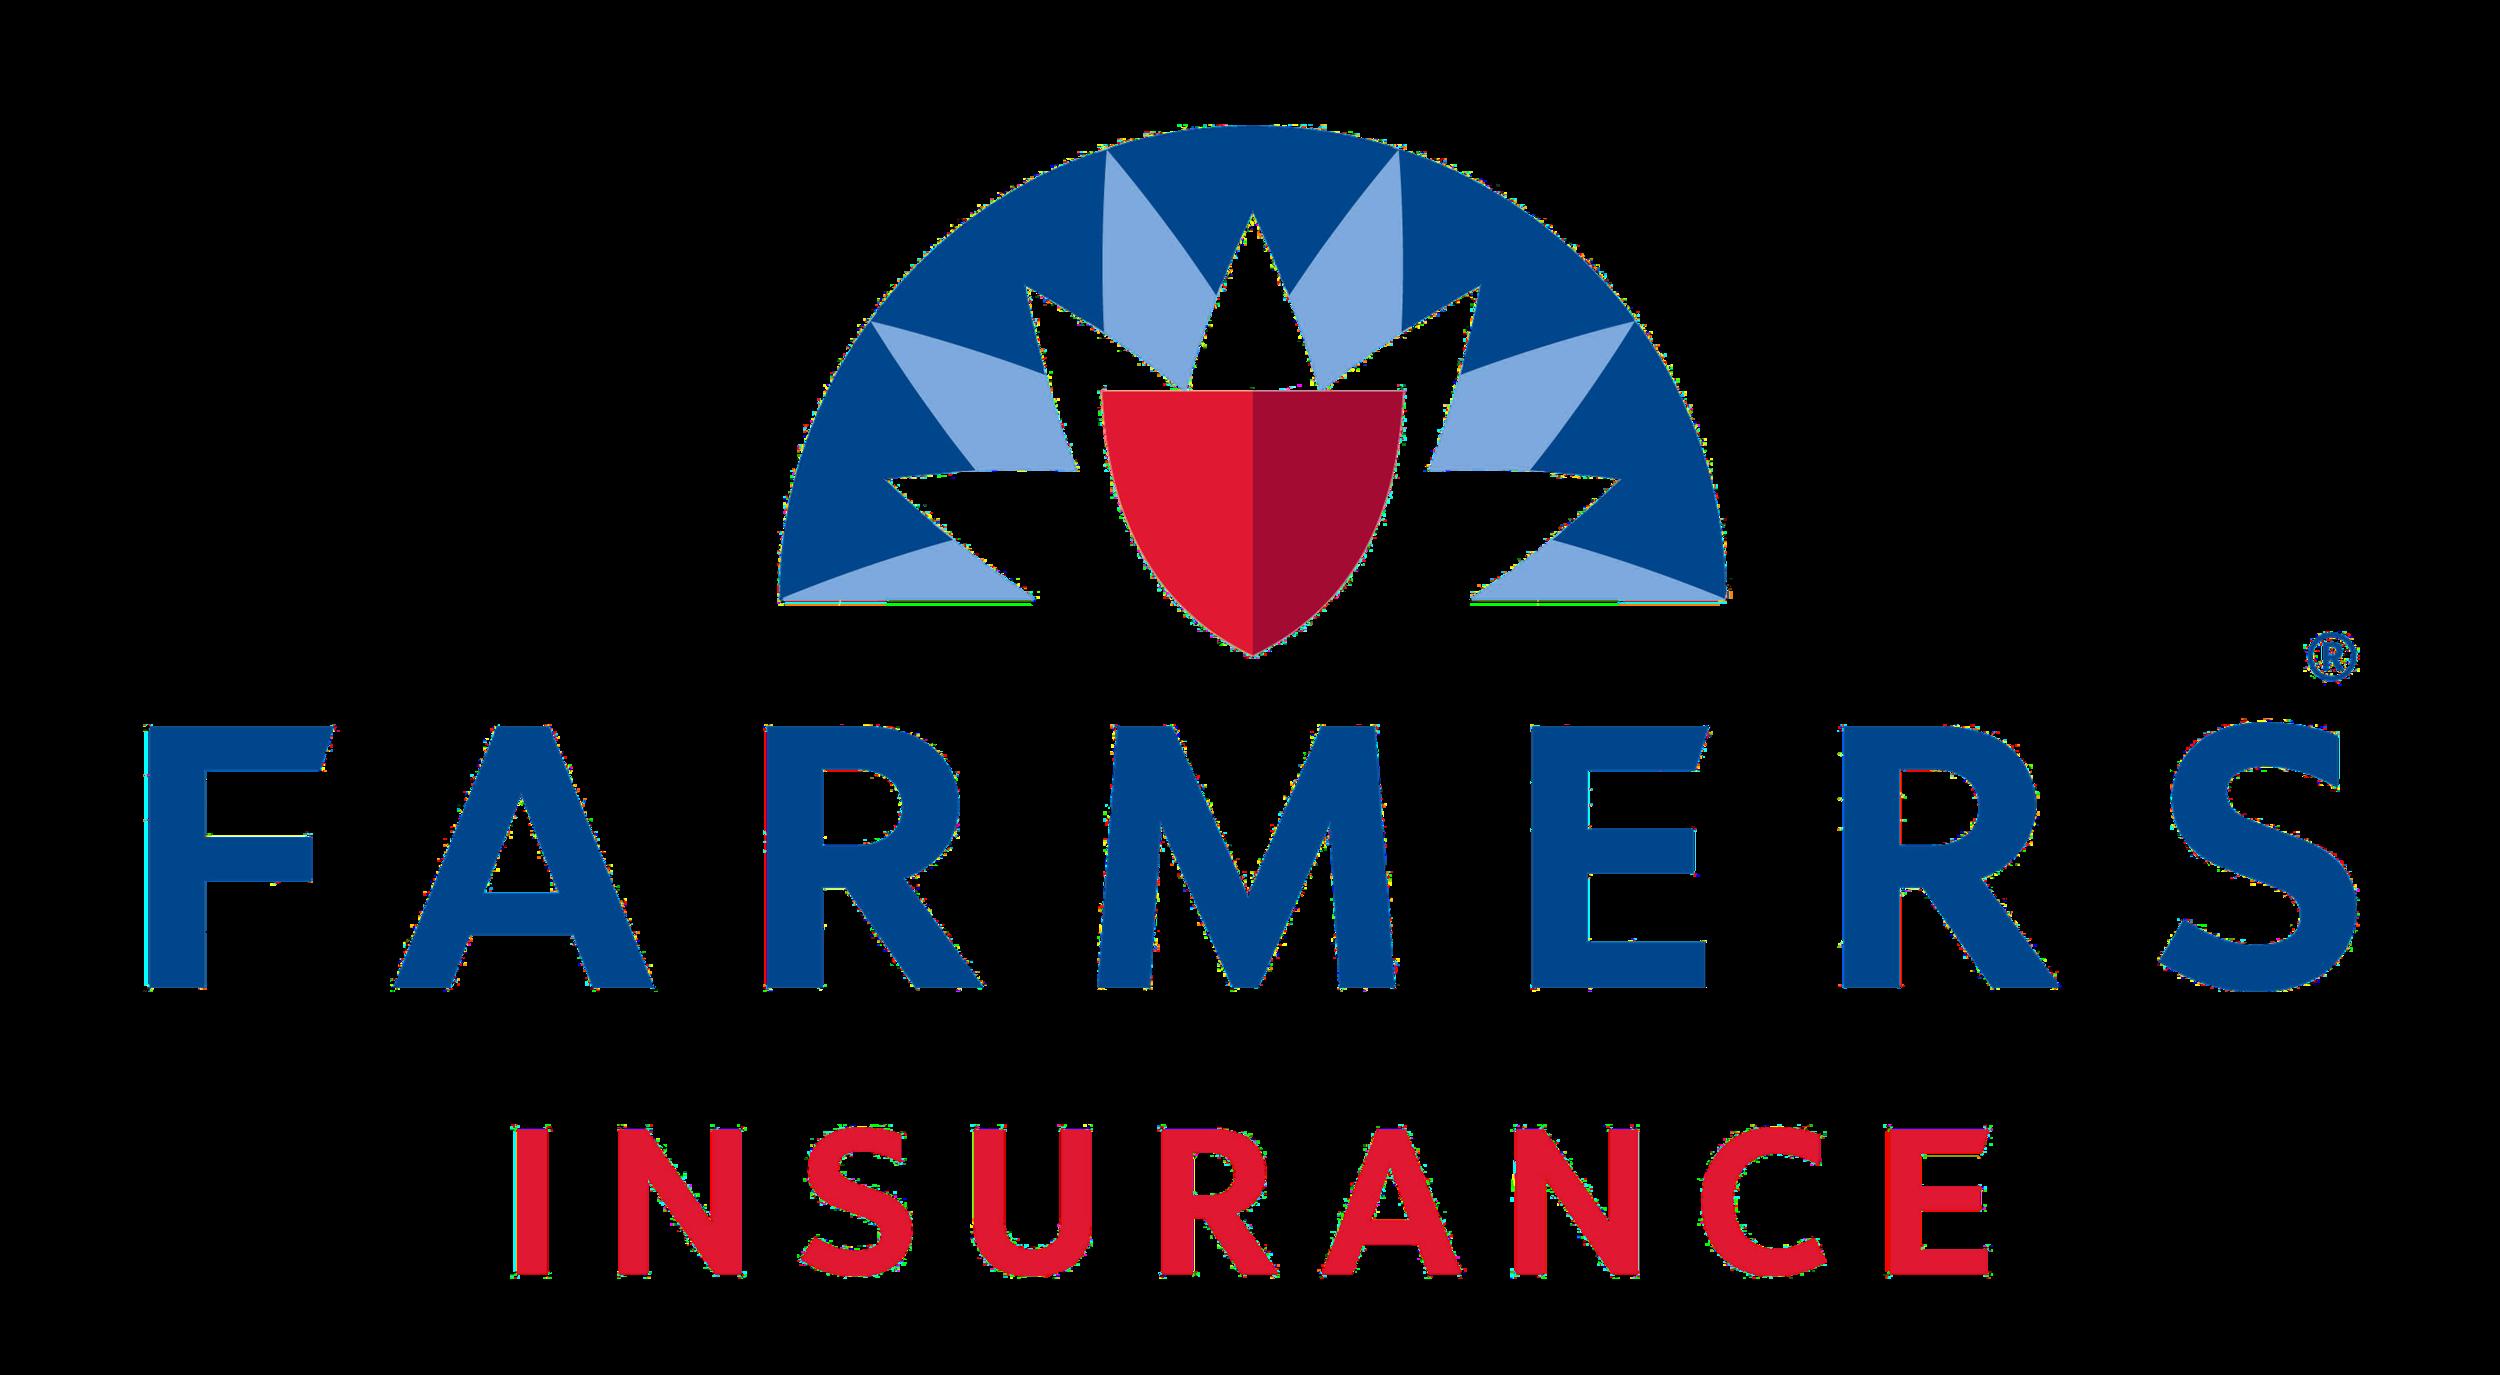 purepng.com-farmers-insurance-exchange-logologobrand-logoiconslogos-251519939032okora.png